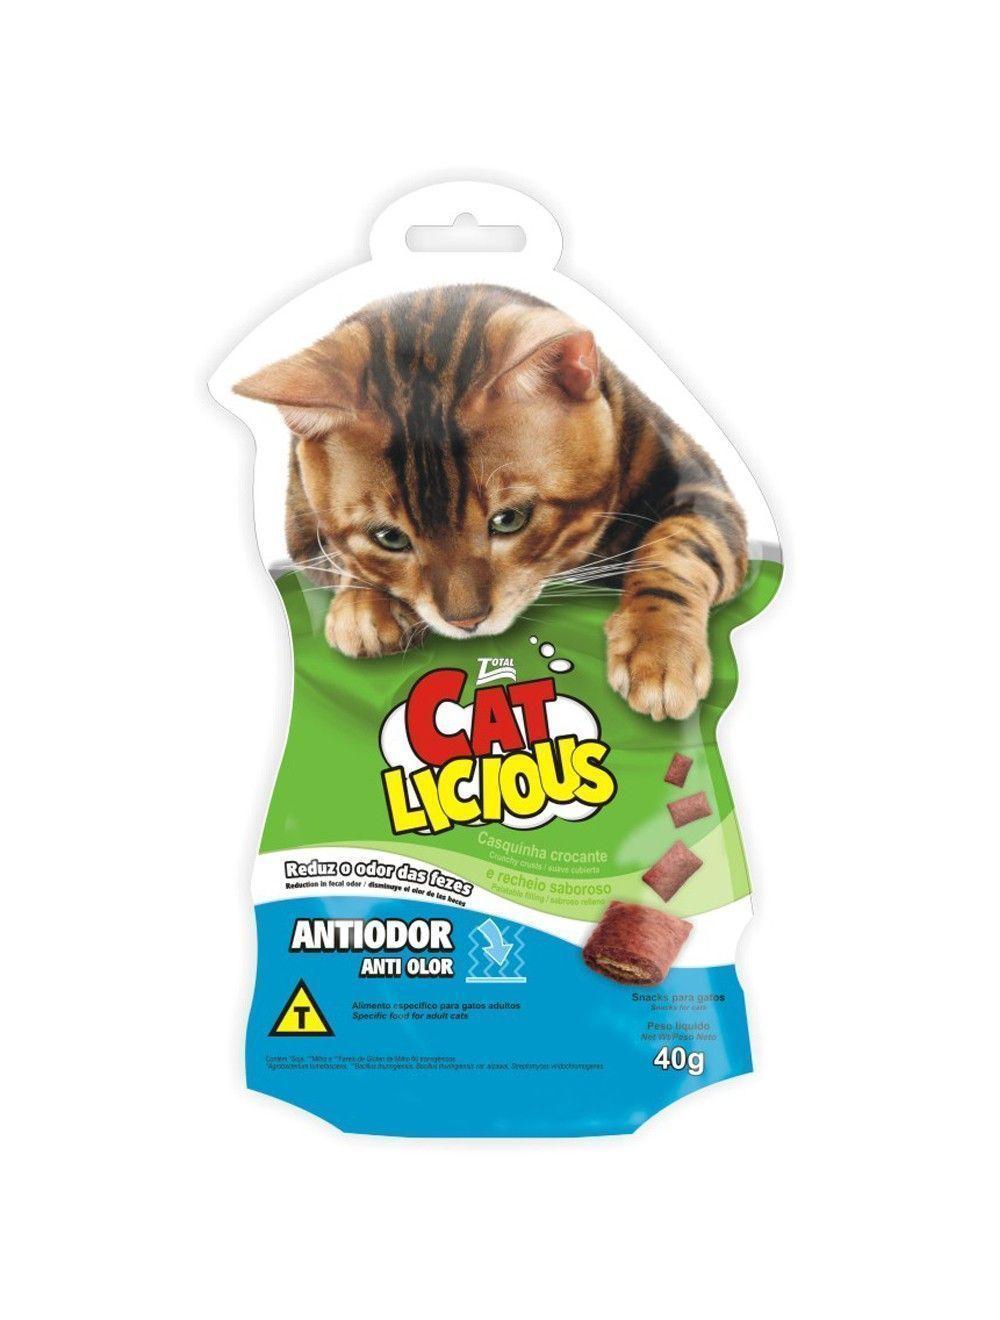 Snacks Cat Licious Antiodor